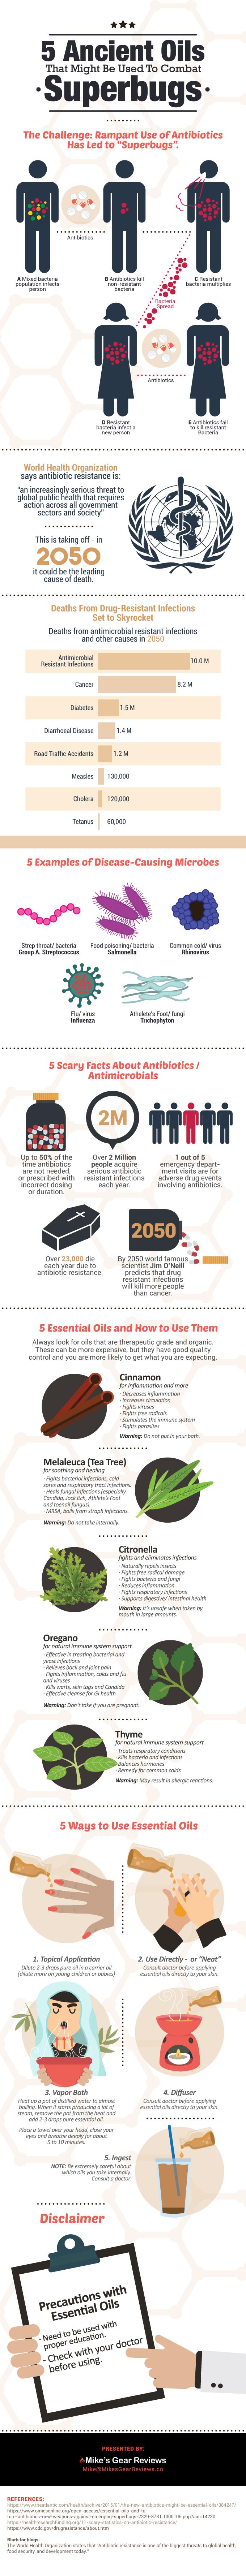 Oils and Superbugs IG.jpg